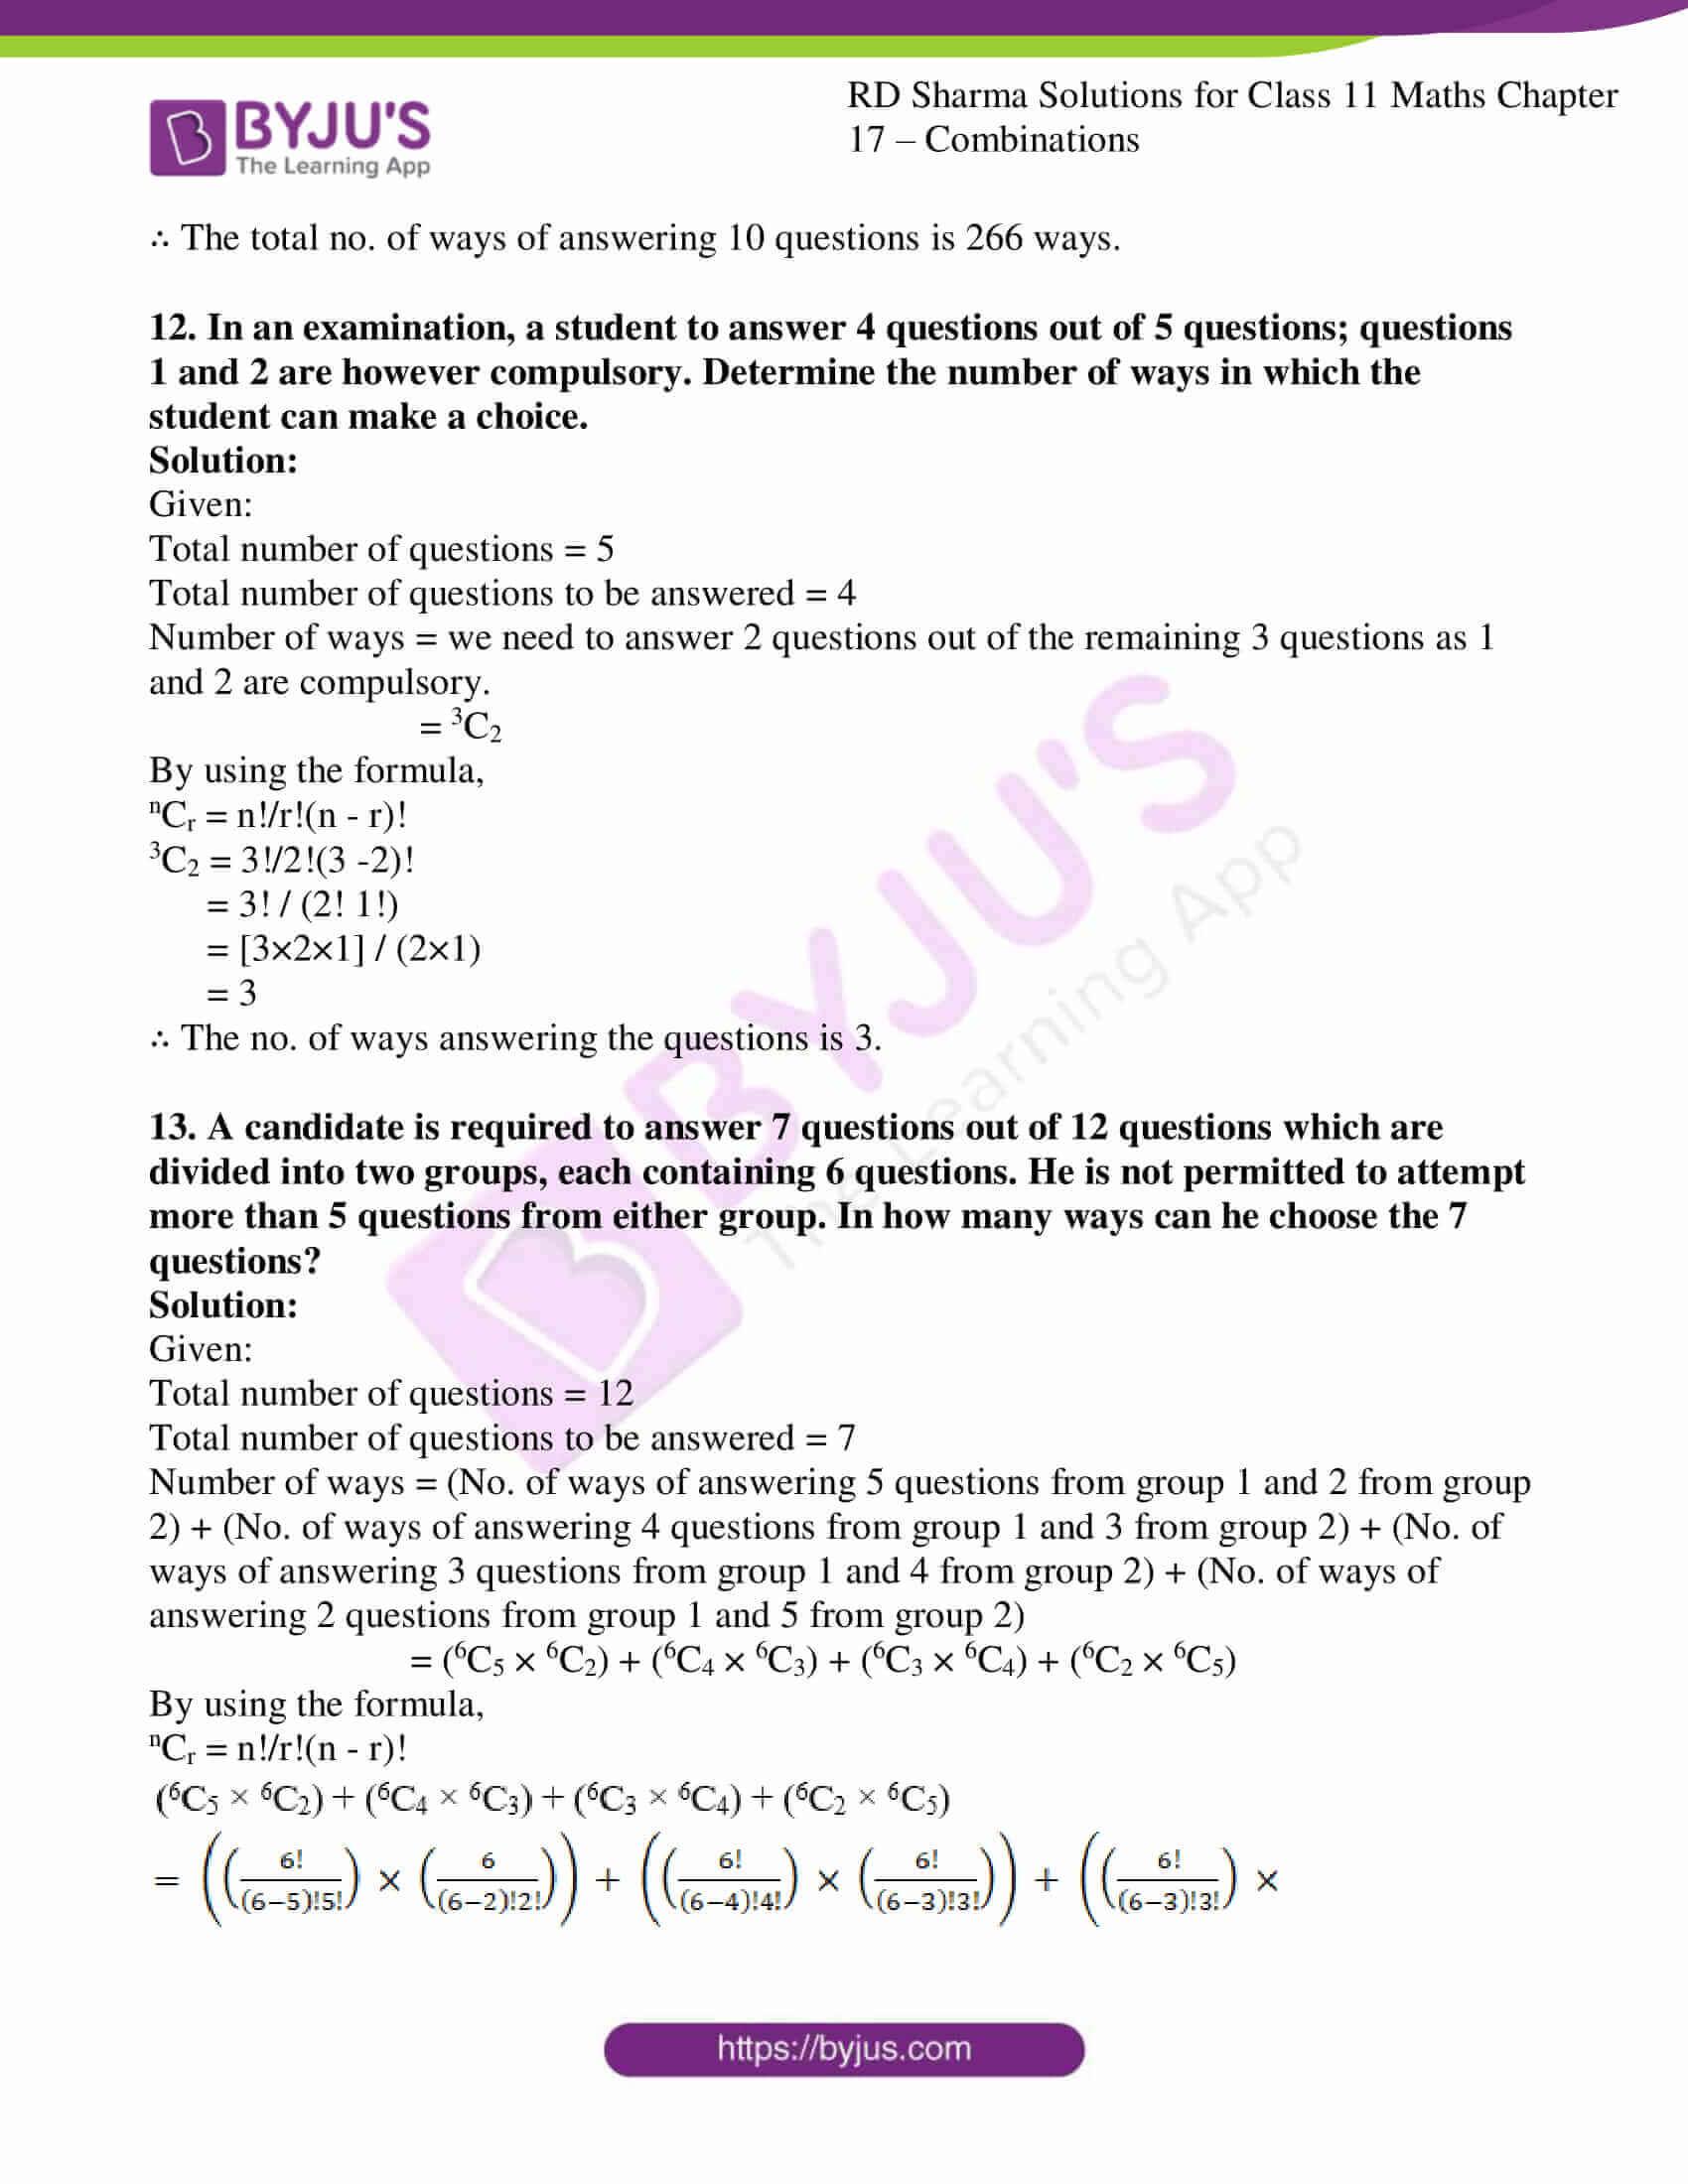 rd sharma class 11 maths ch 17 ex 2 10